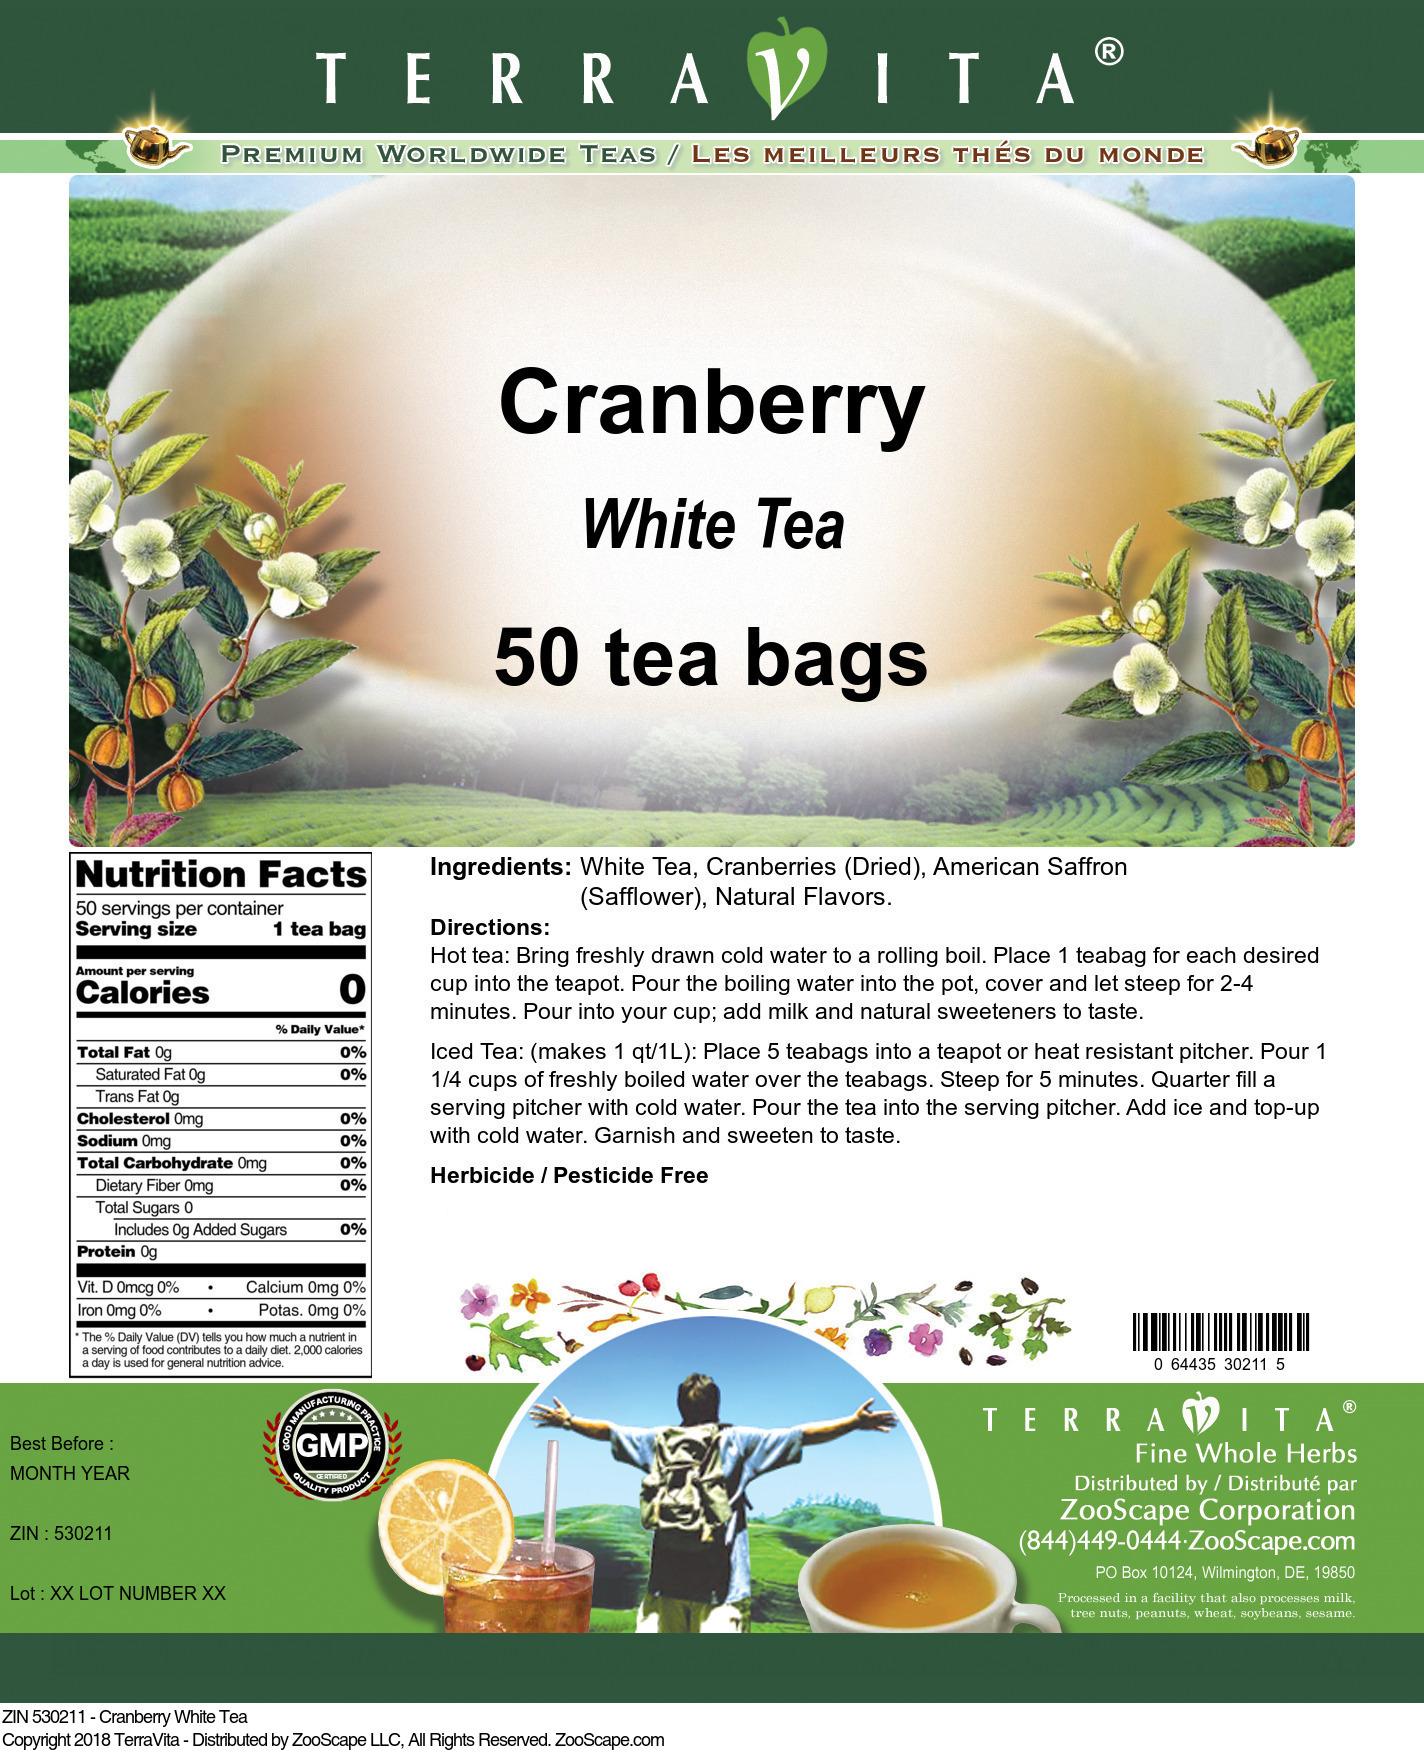 Cranberry White Tea